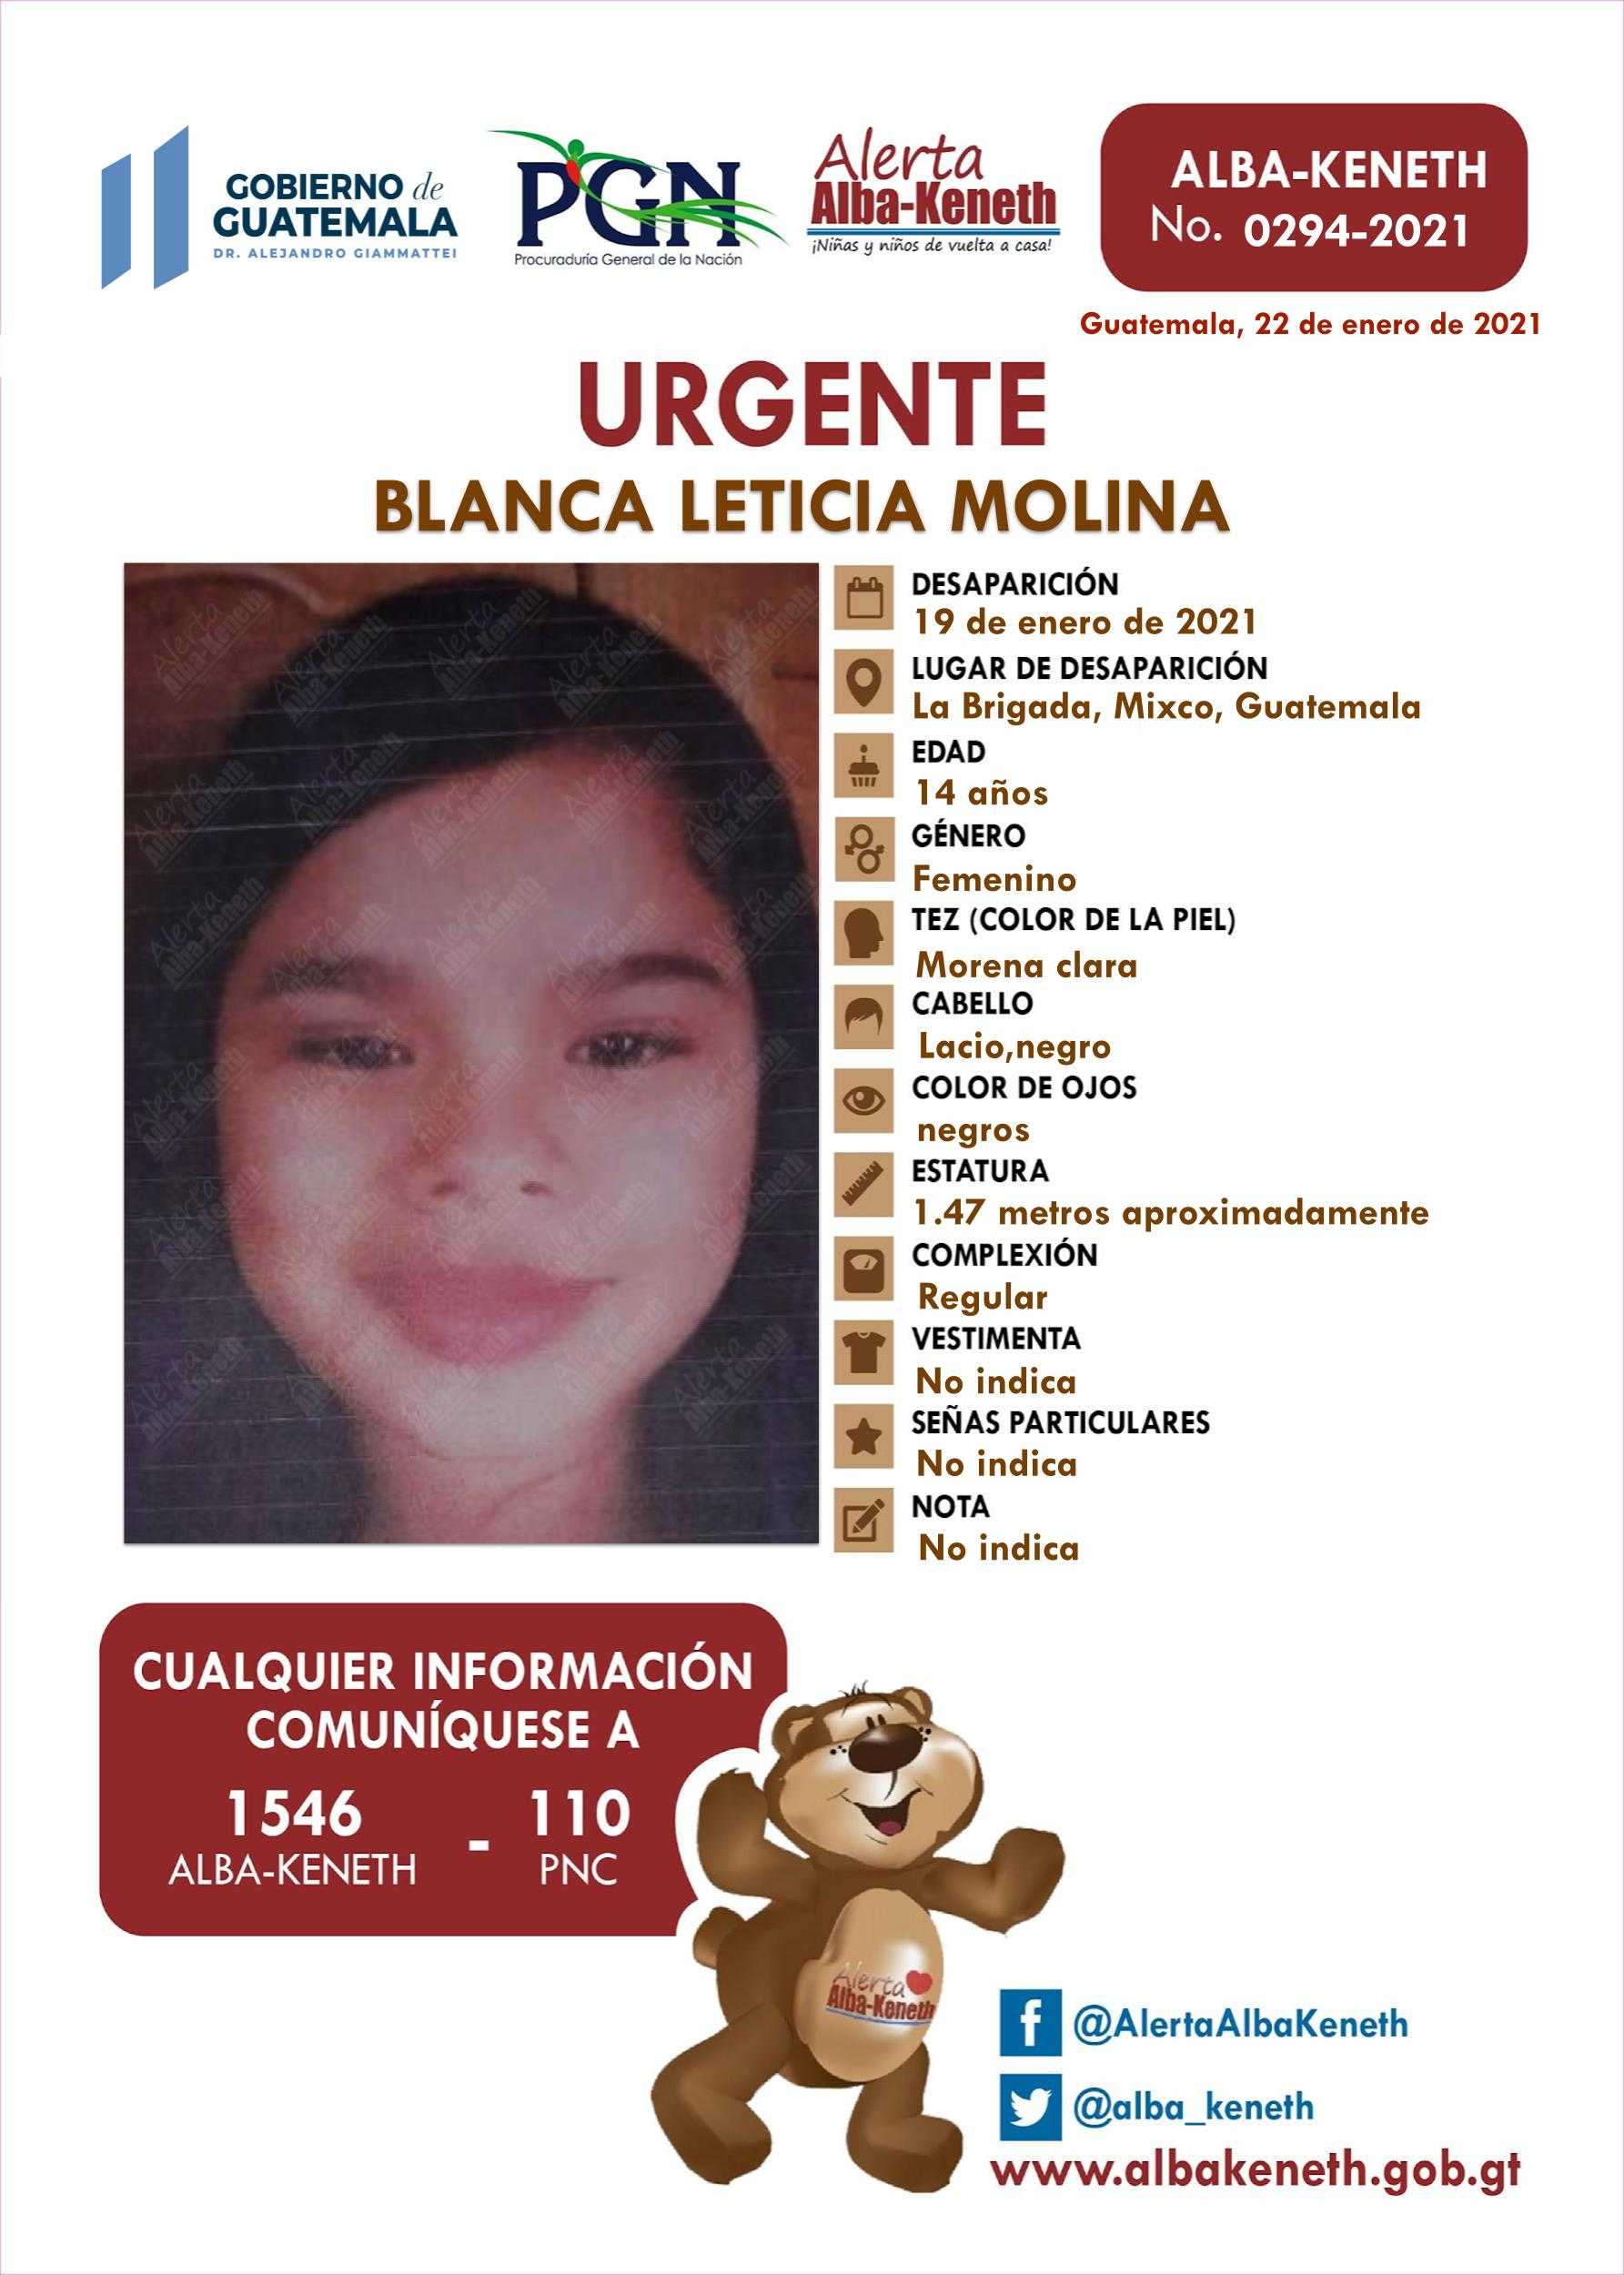 Blanca Leticia Molina